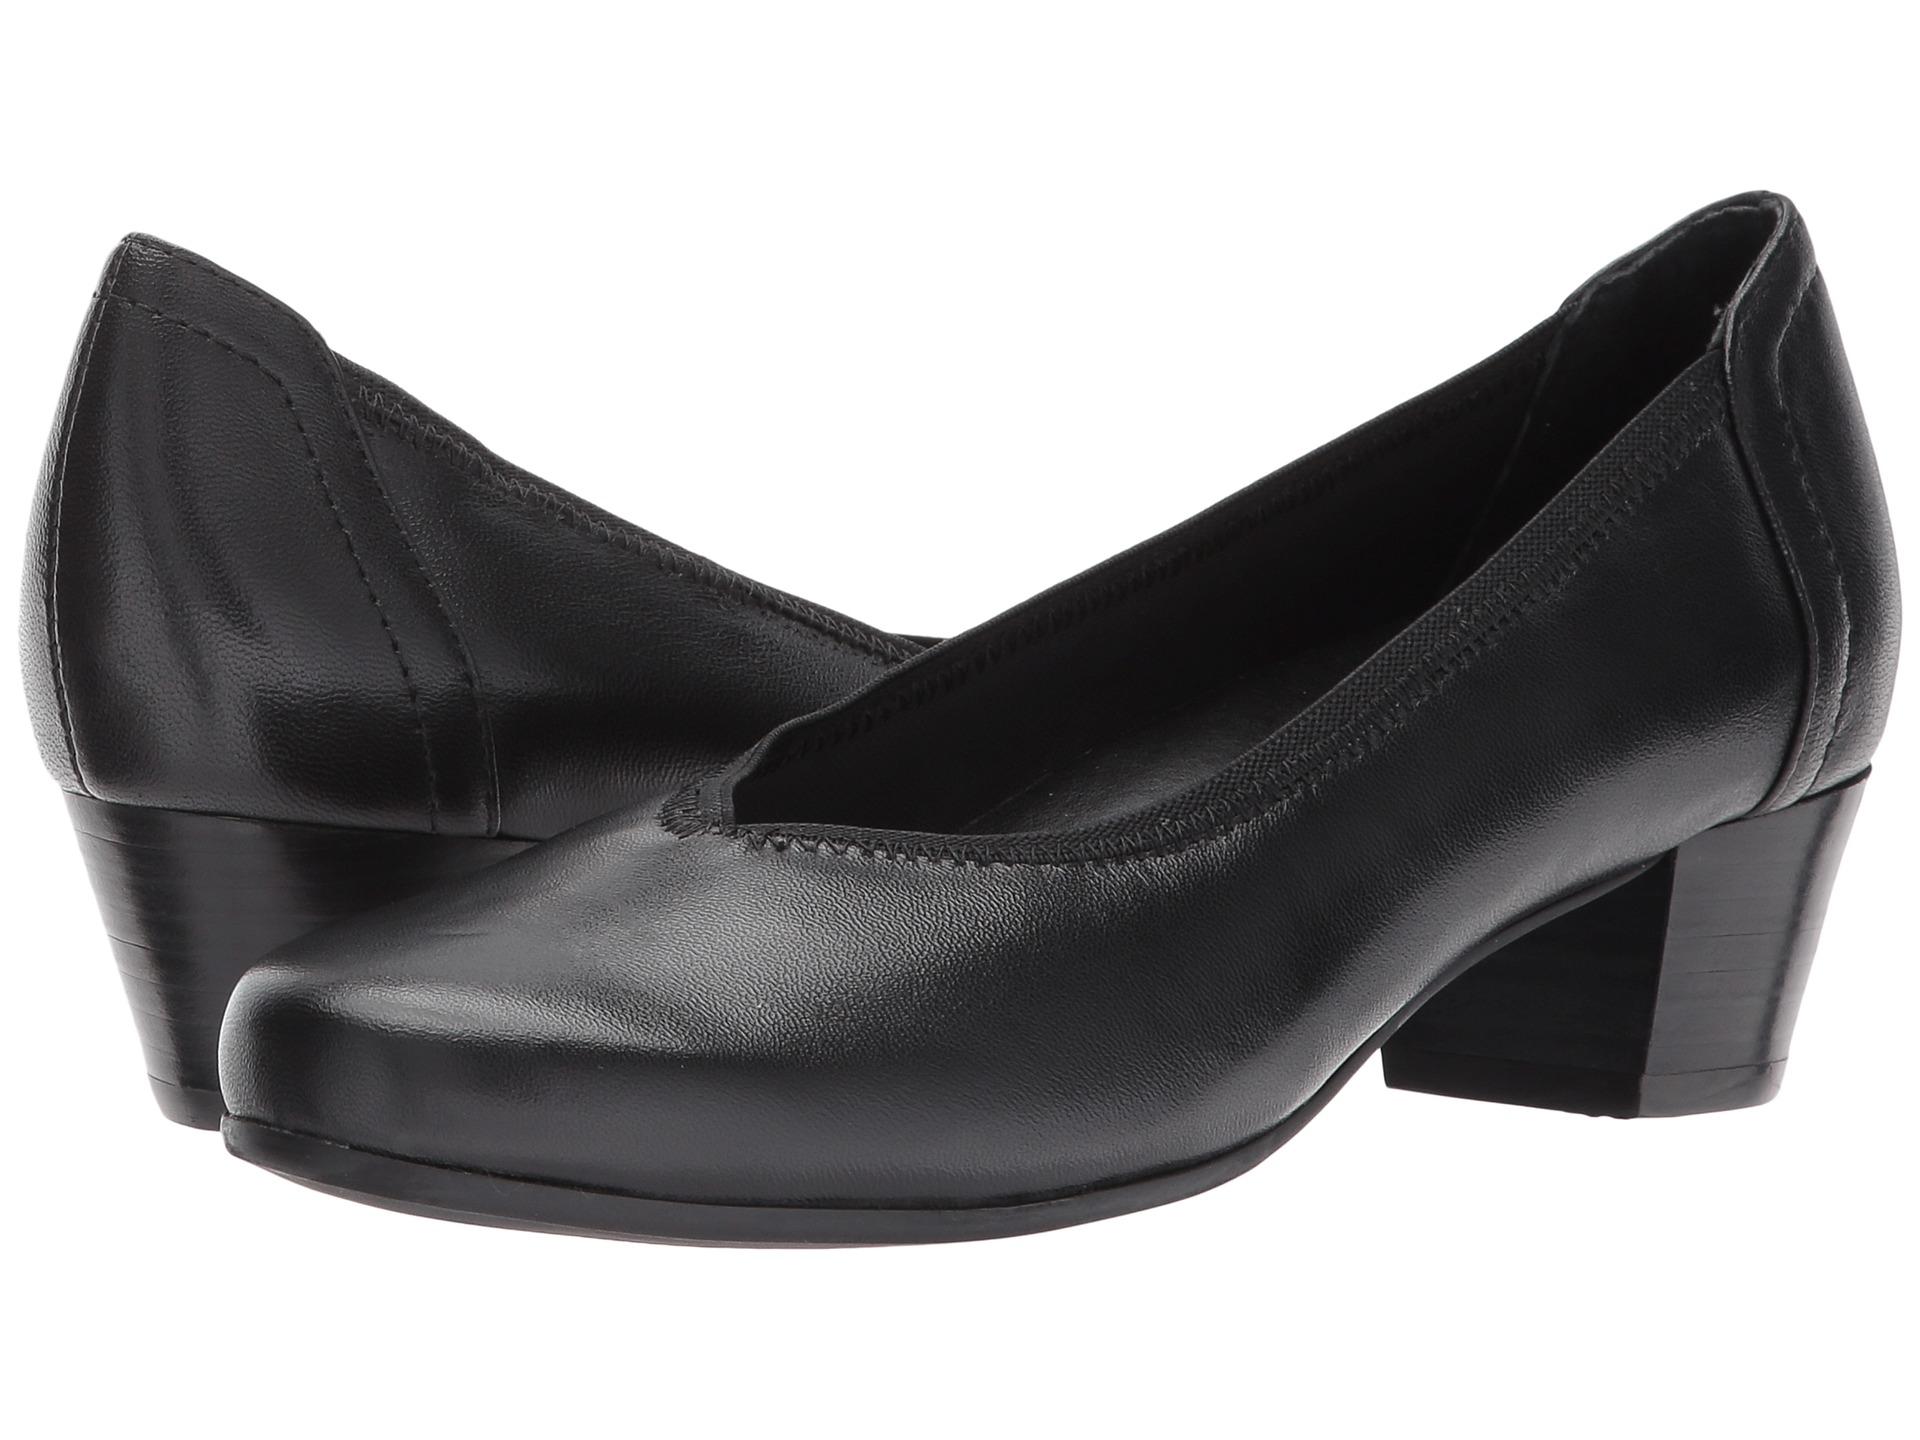 David Tate Shoes Reviews